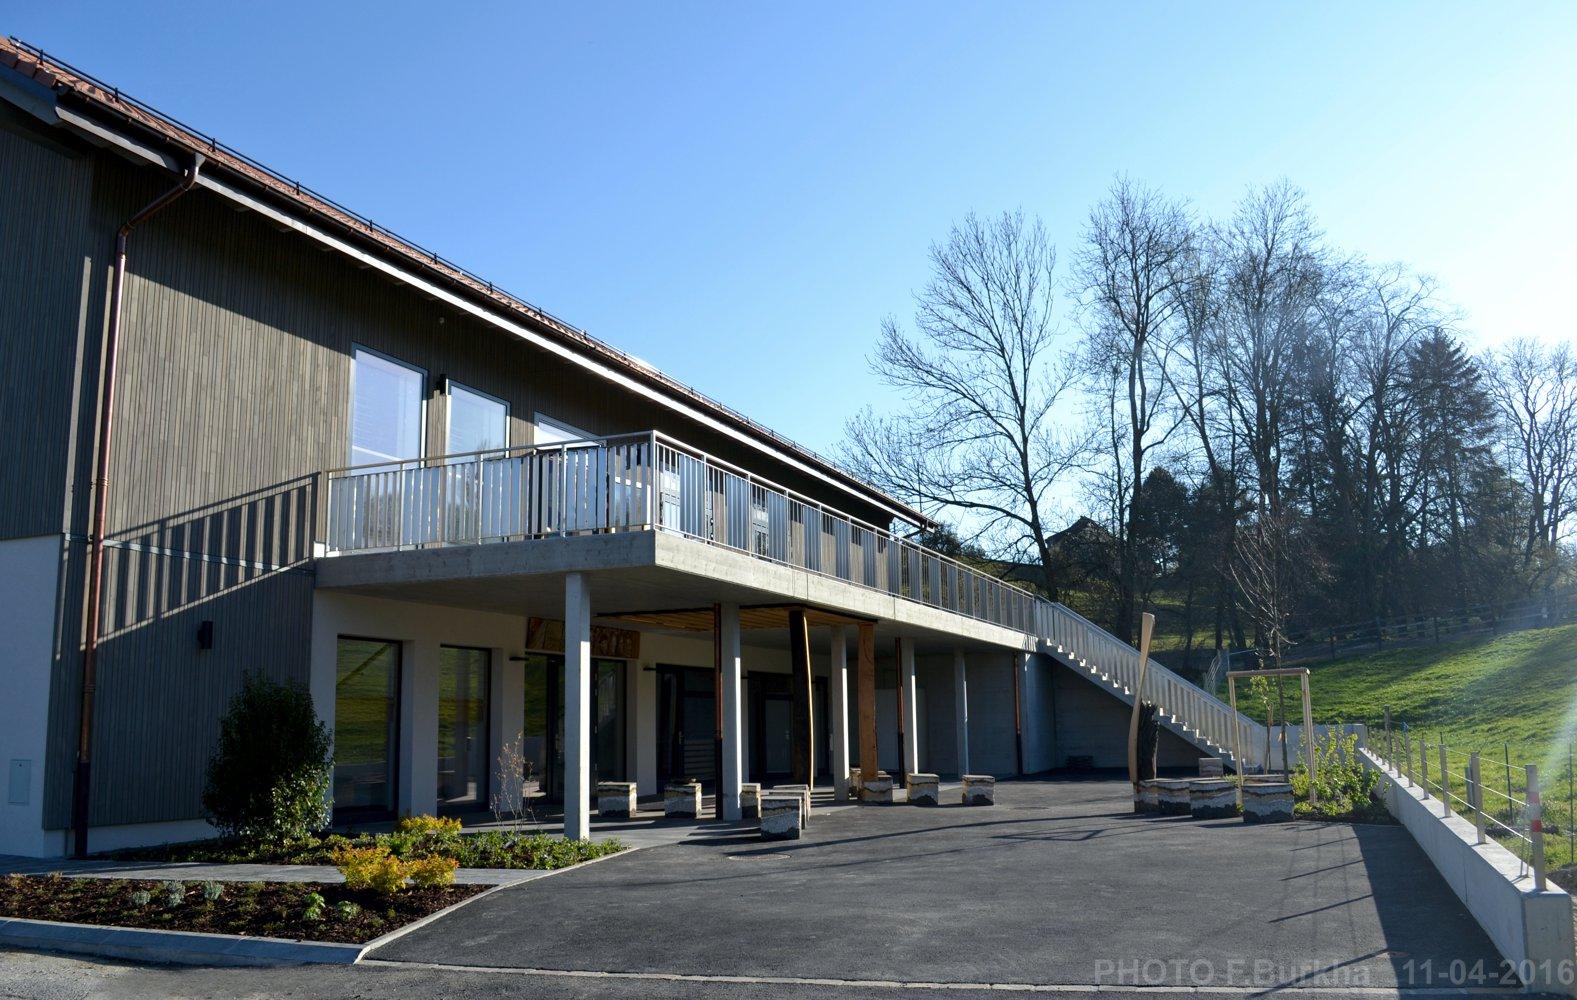 Salle communale Orzens - PORCHE-ENTREE instal F-Burkha - 11-04-2017